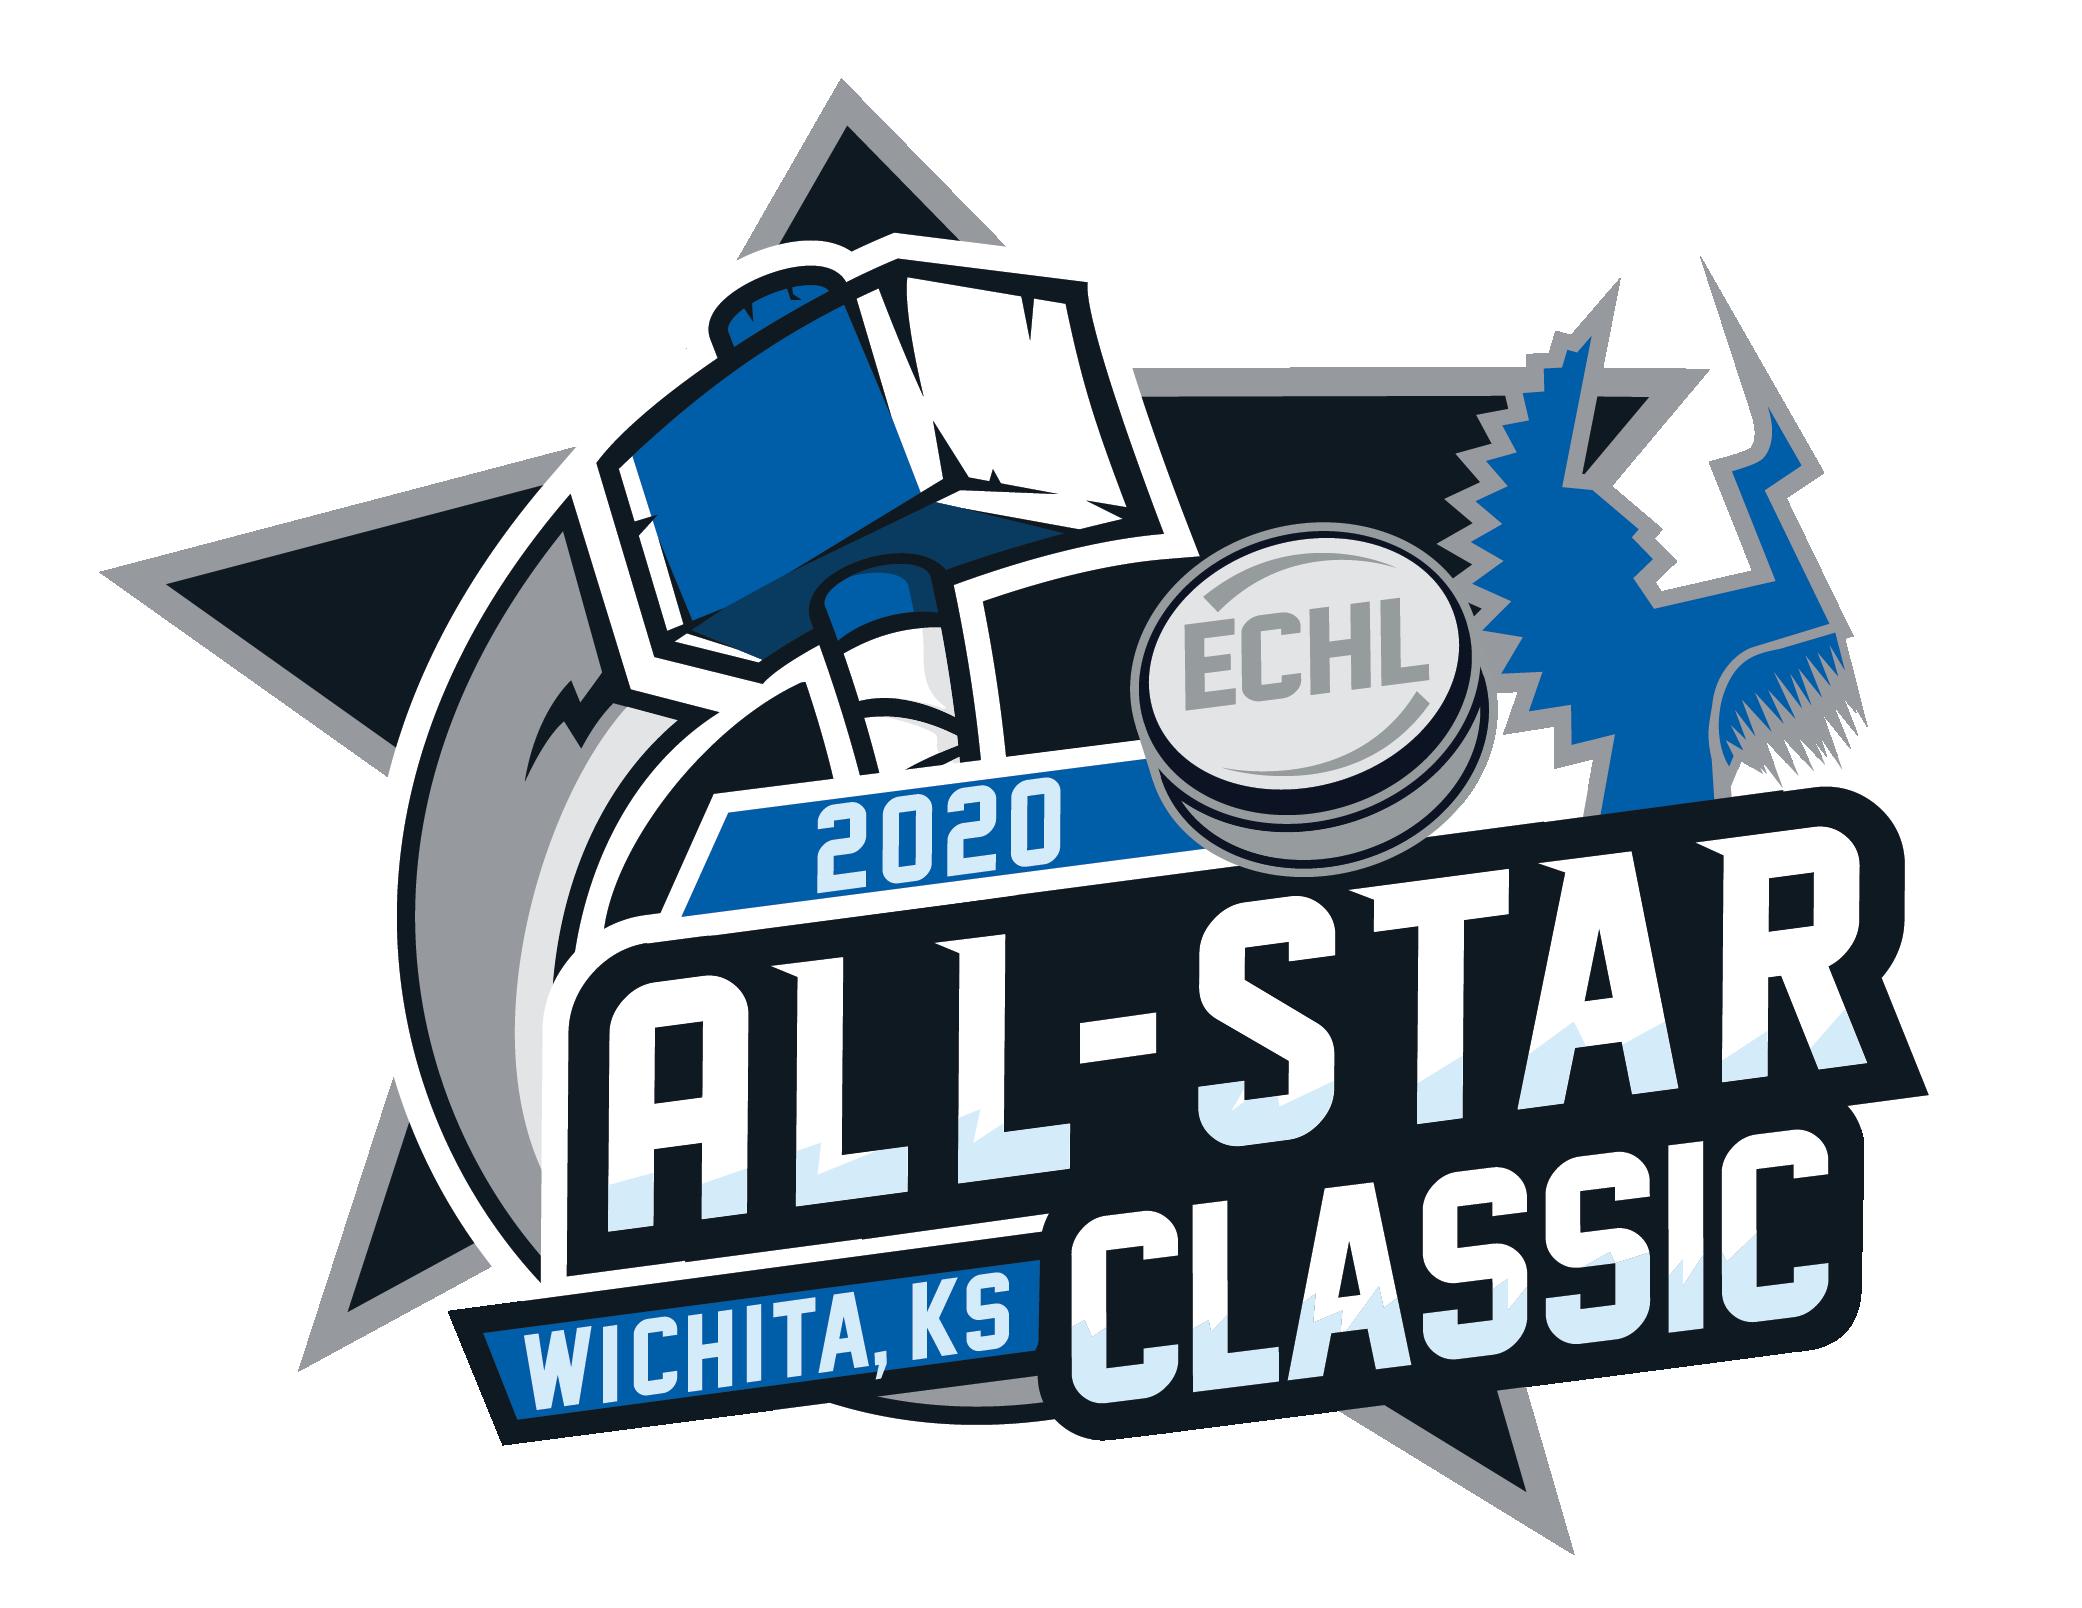 echl_all-star_classic_2020